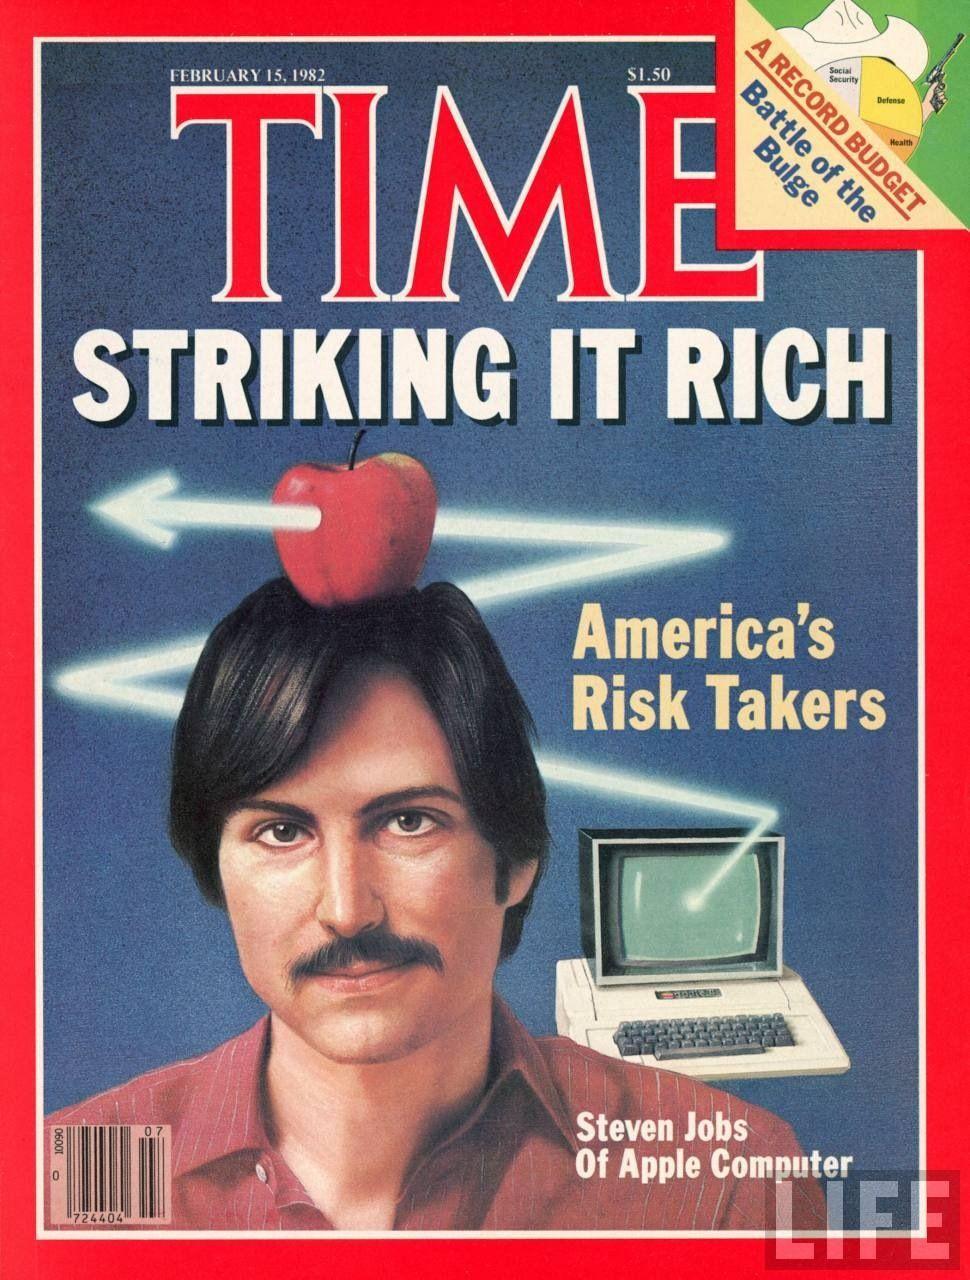 Steve Jobs - Portada de Time - 15 Febrero 1.982 | Vintage Magazine ...